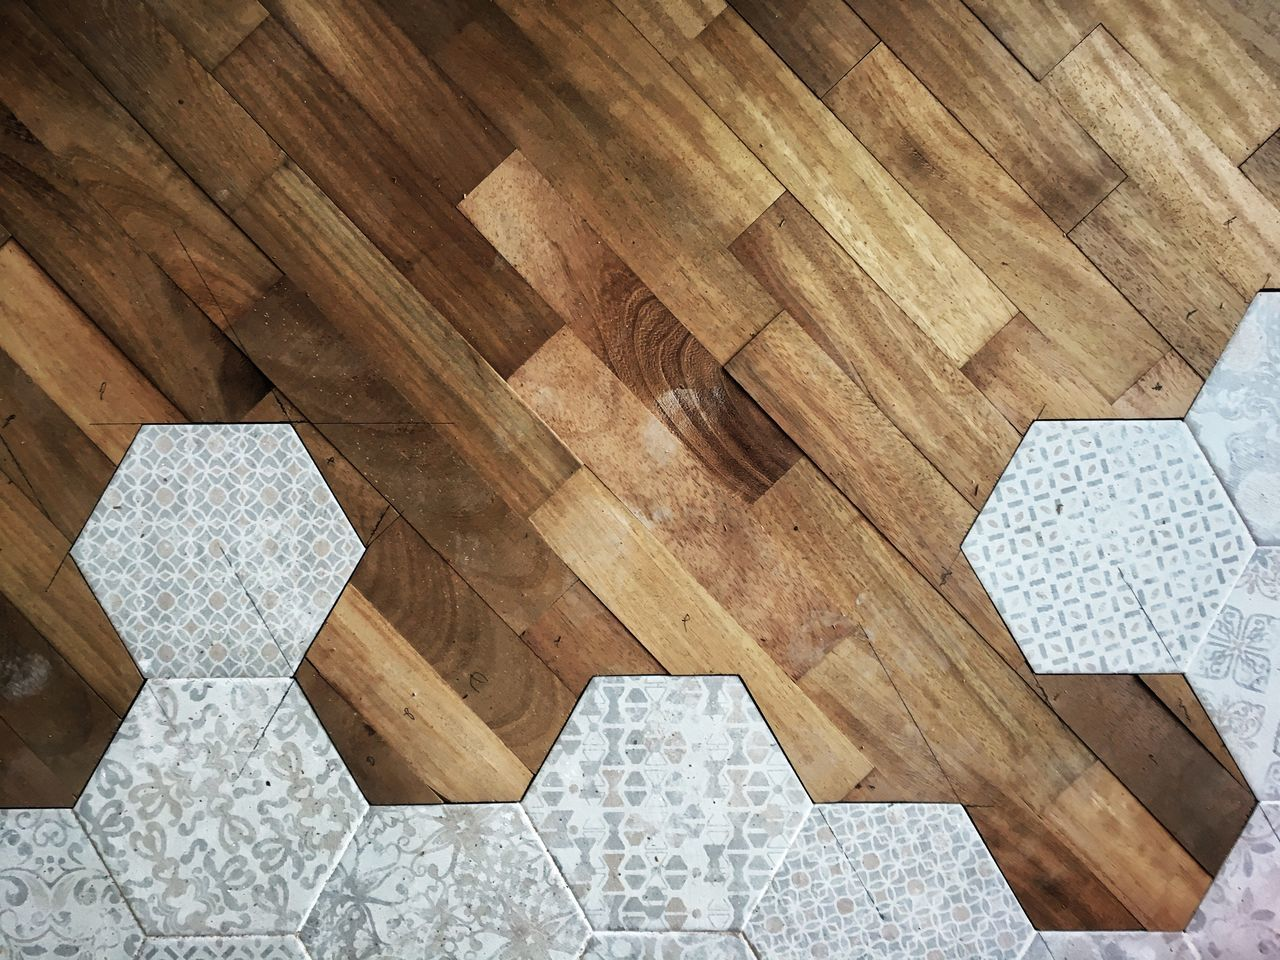 Minimalist Architecture Bee Floor David De La Cruz Delacruzfotografia